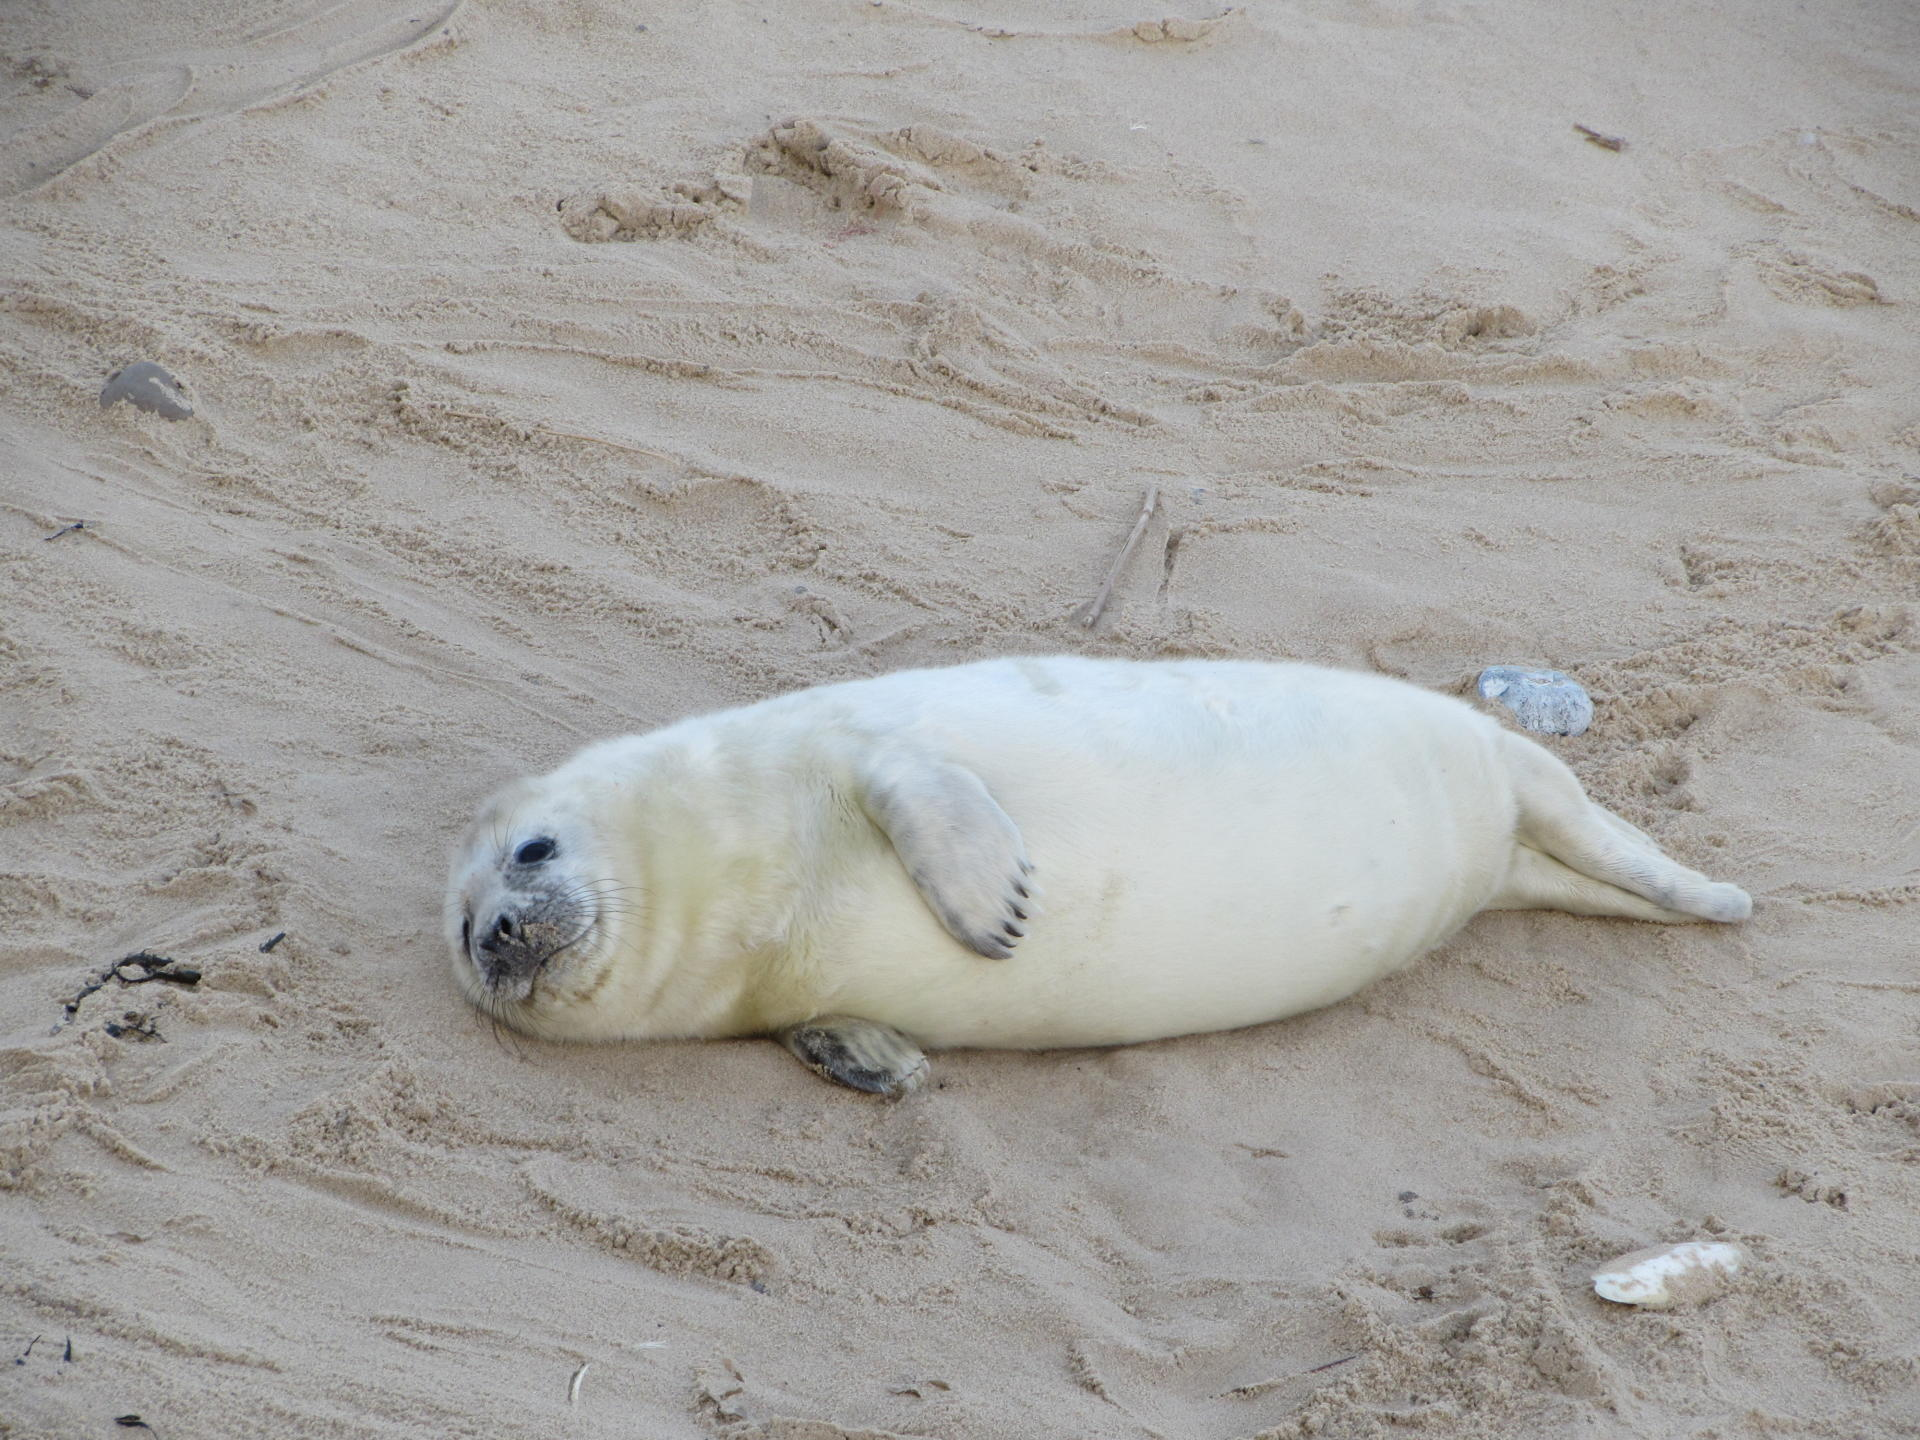 Seal Watching in North Norfolk - Yesihaveablog   Seals Norfolk Horsey Gap   Seal Colony   Norfolk - Life in a Fine City   Winterlust